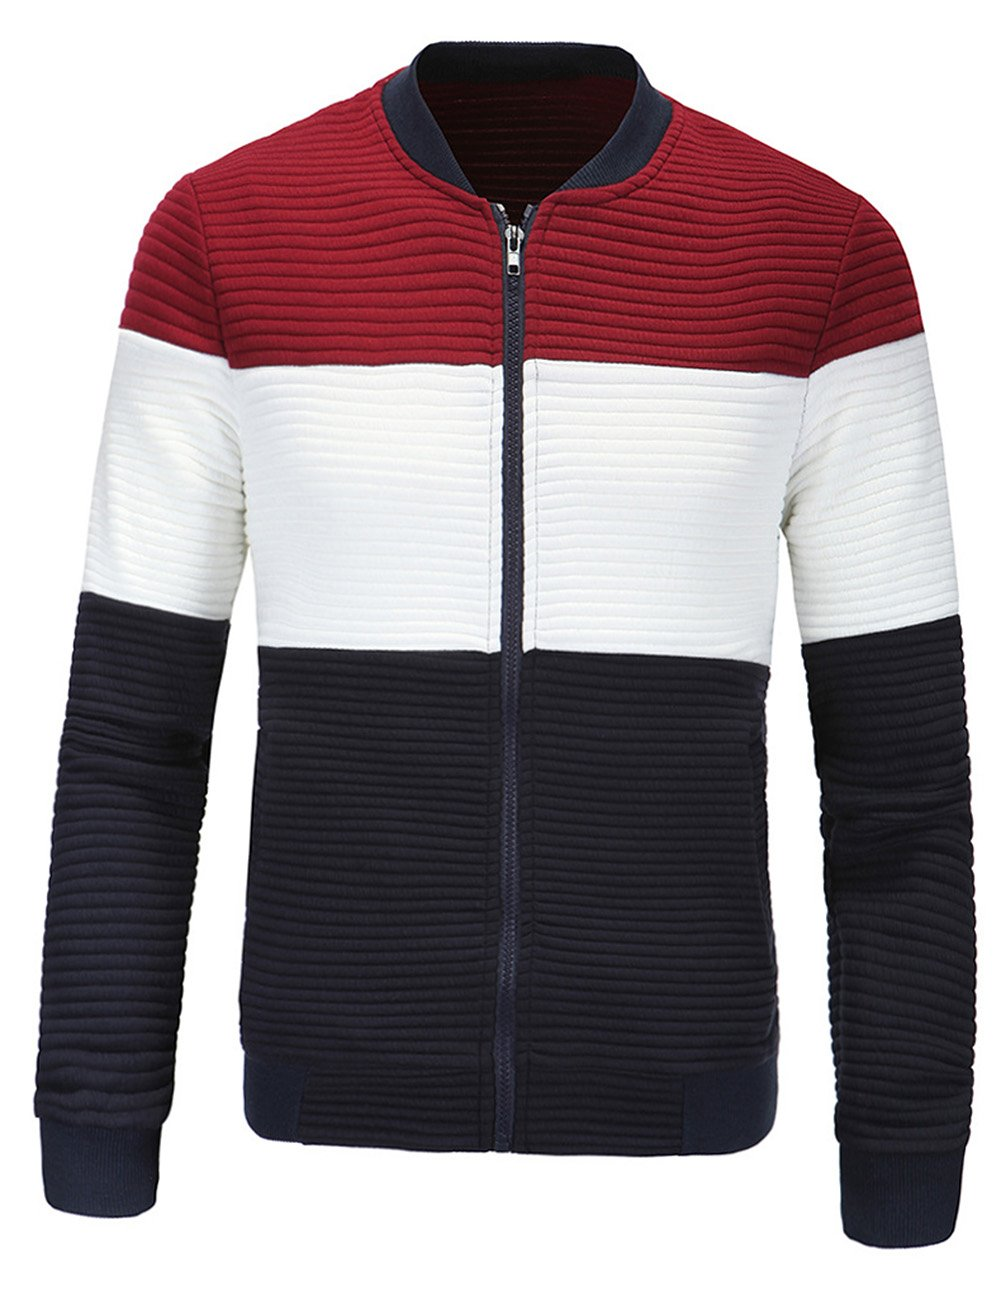 Yiwa Men's European Style Stand Collar Slim Cardigan Jacket Red XL